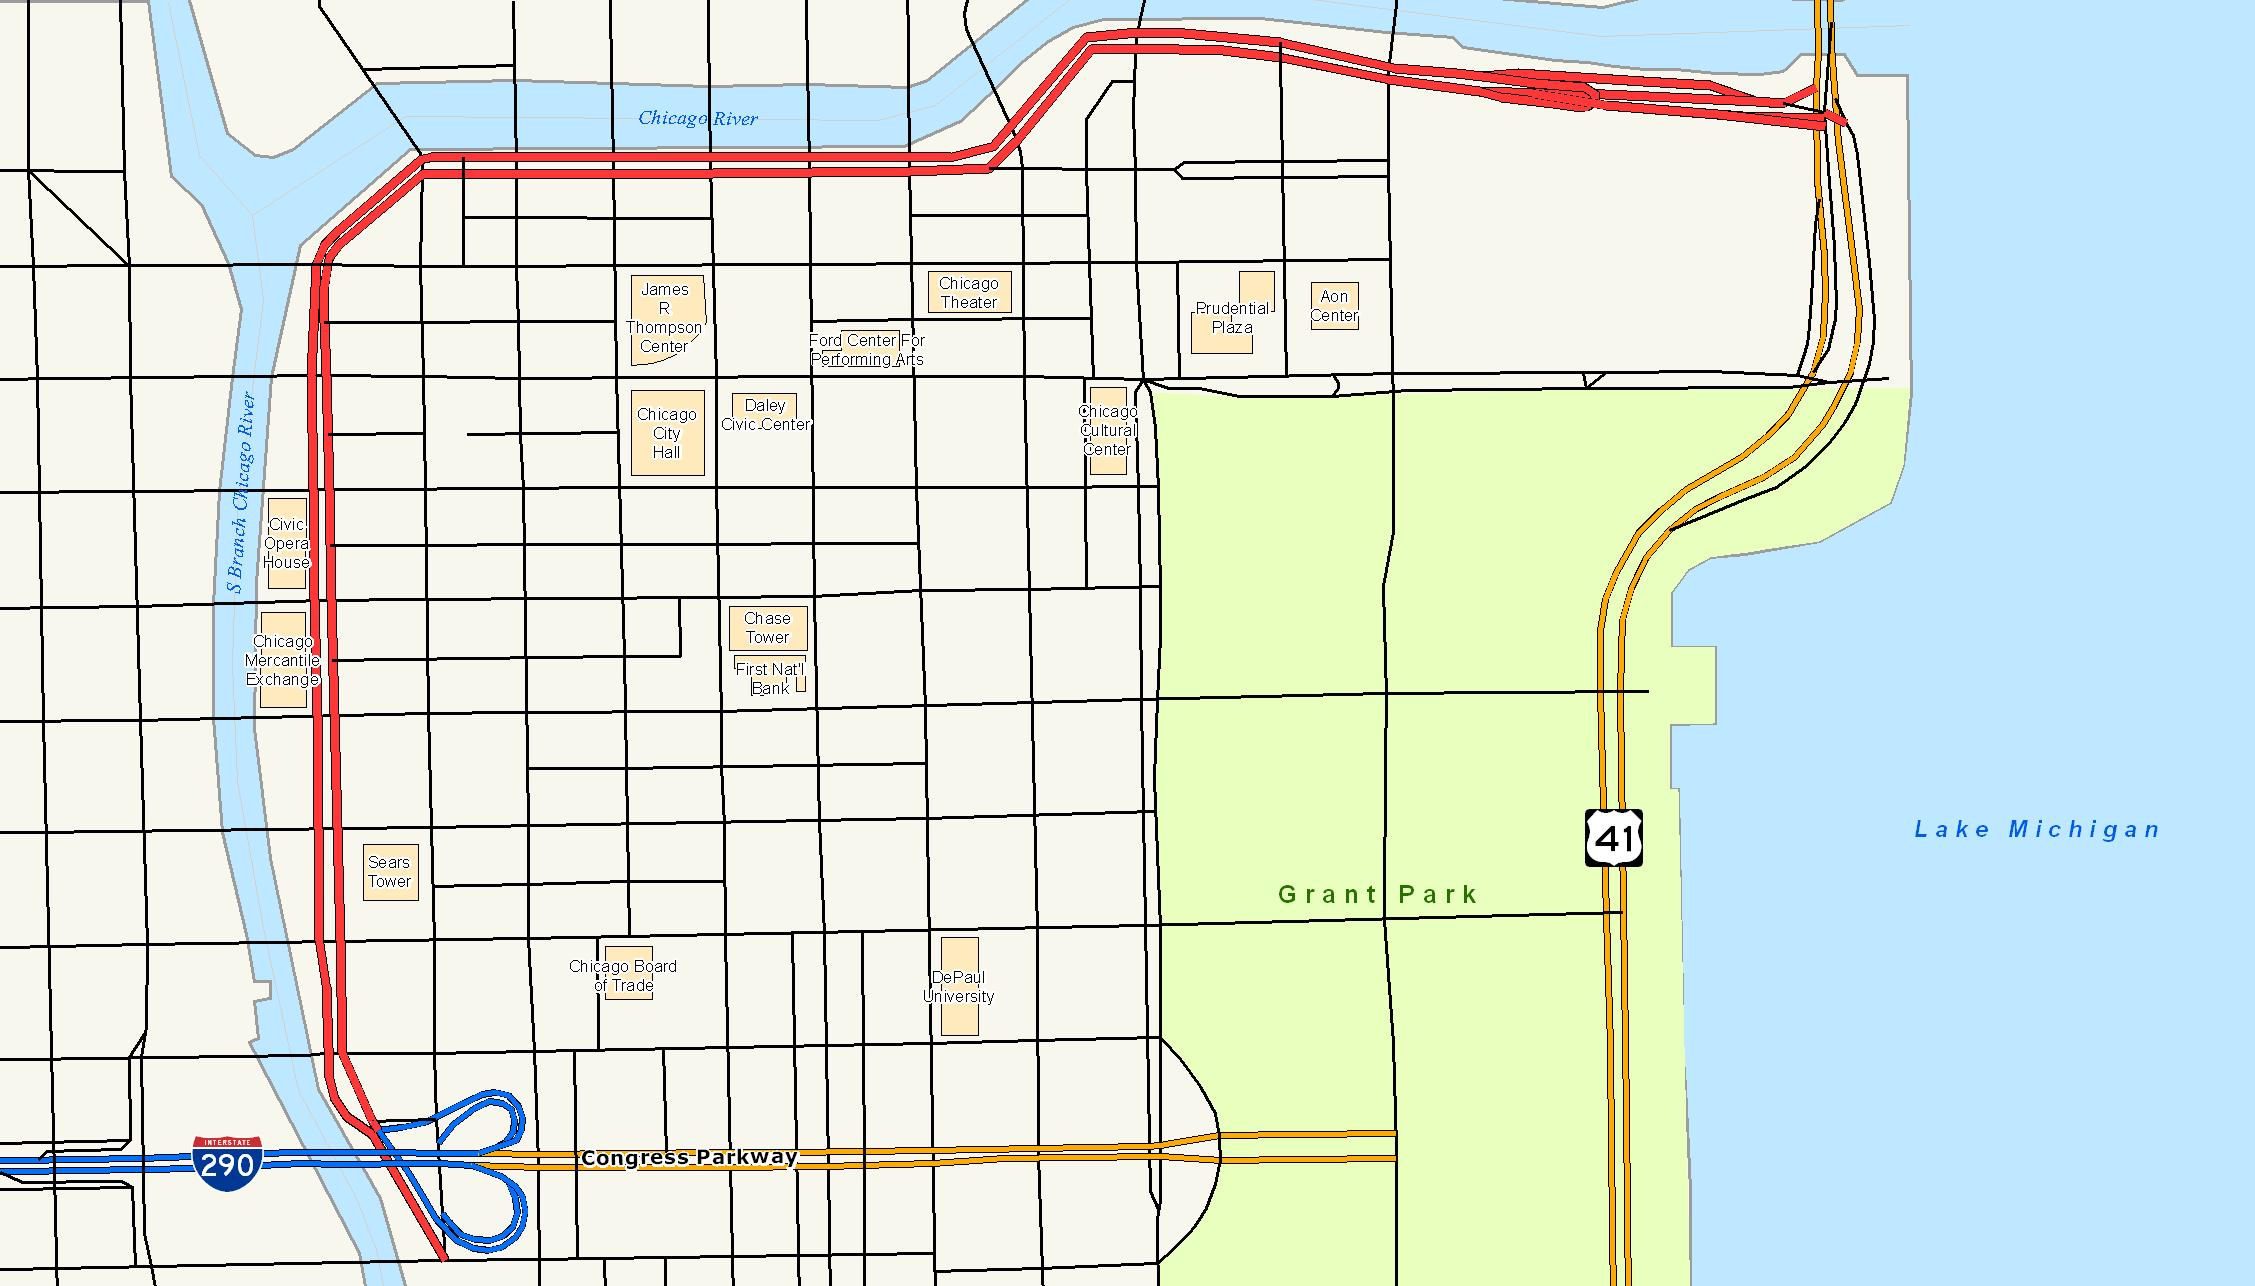 Wacker Drive - Chicago